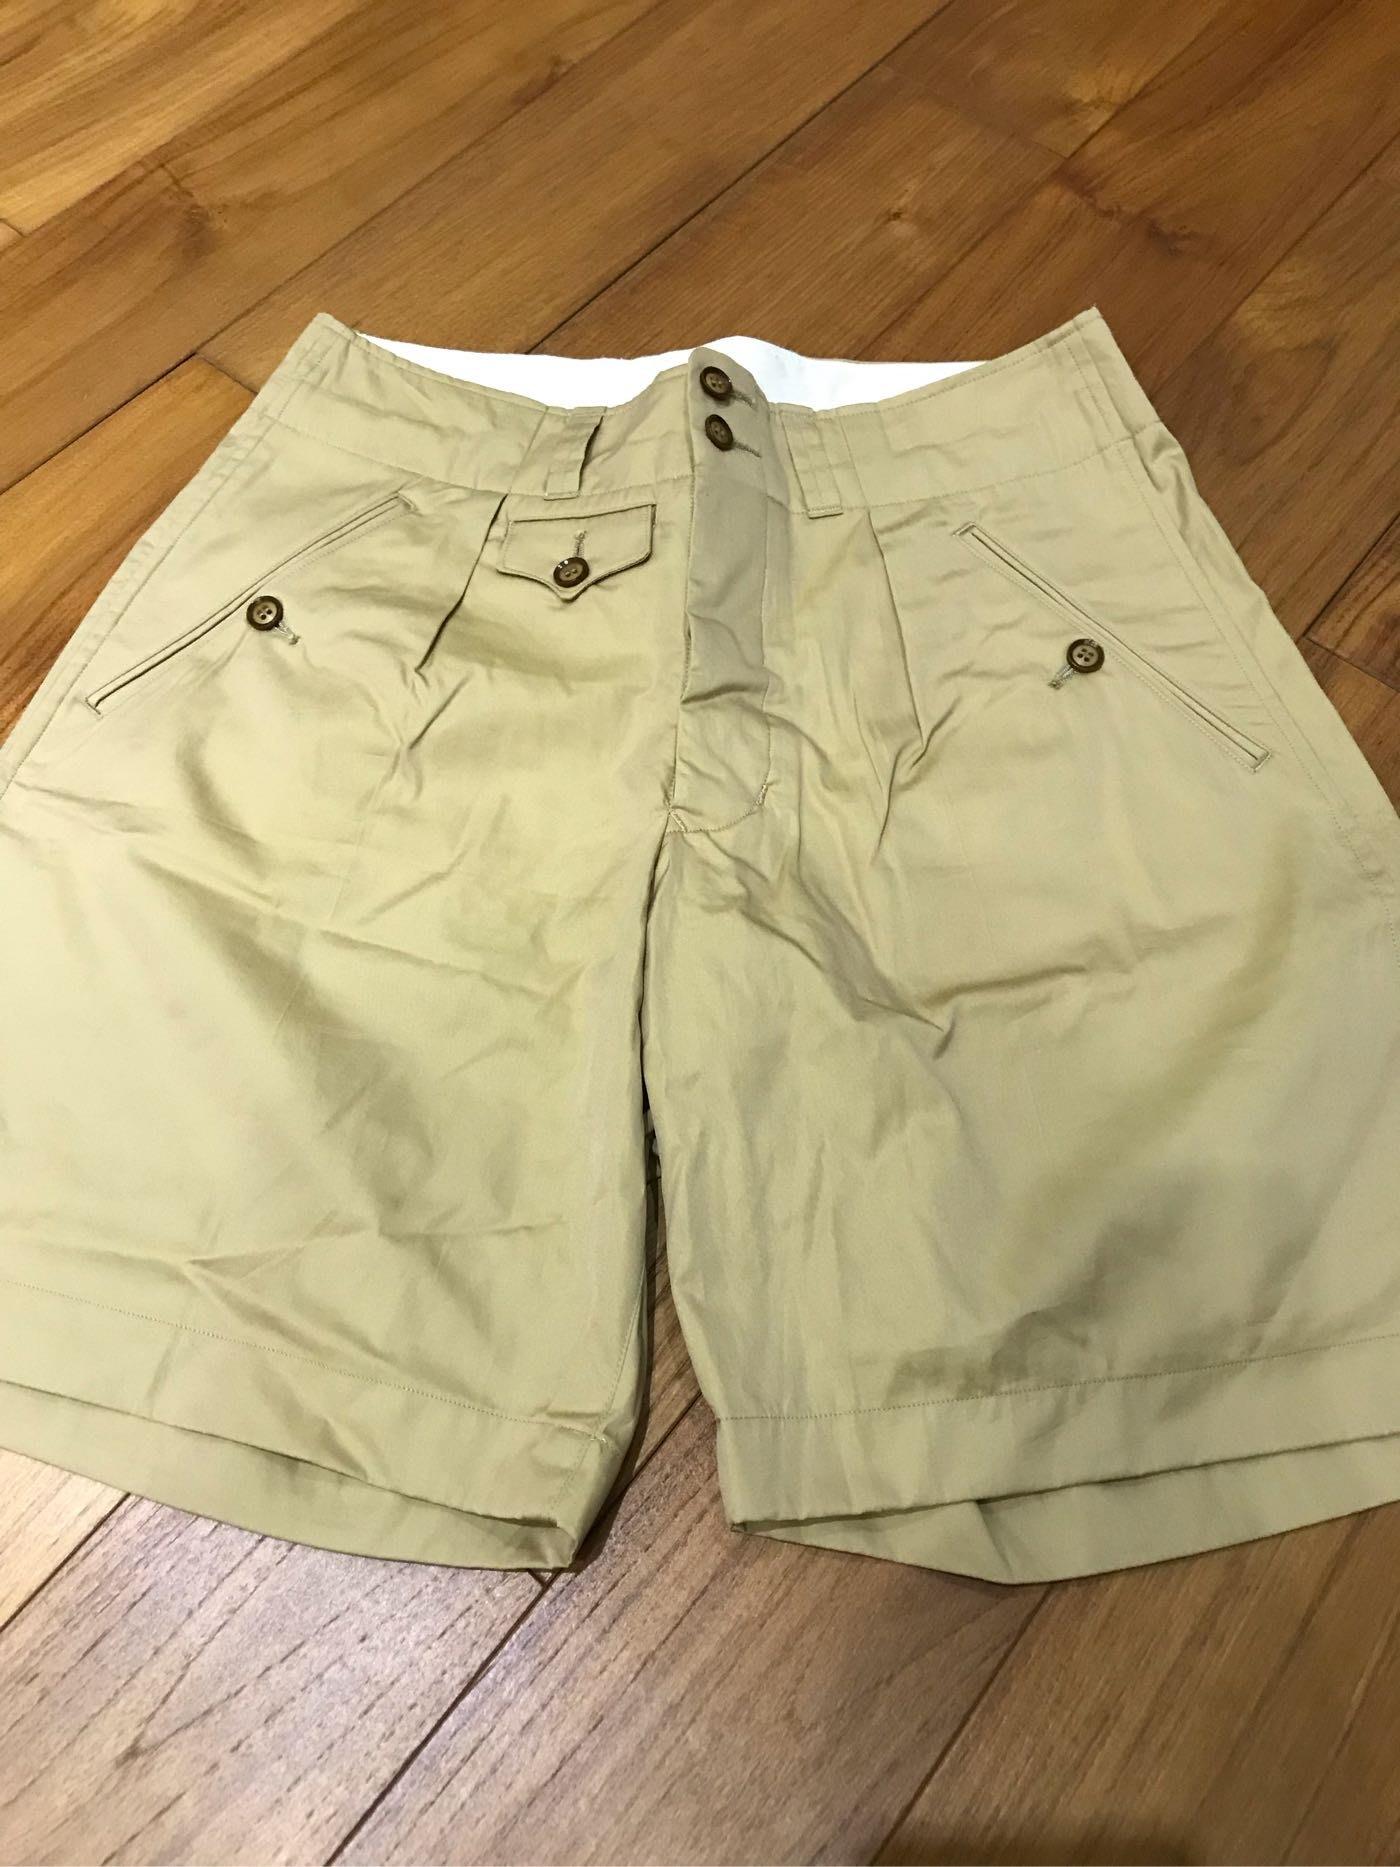 Haversack Khaki Bermuda shorts 卡其色 百慕達短褲 日本製 Nigel mister freedom